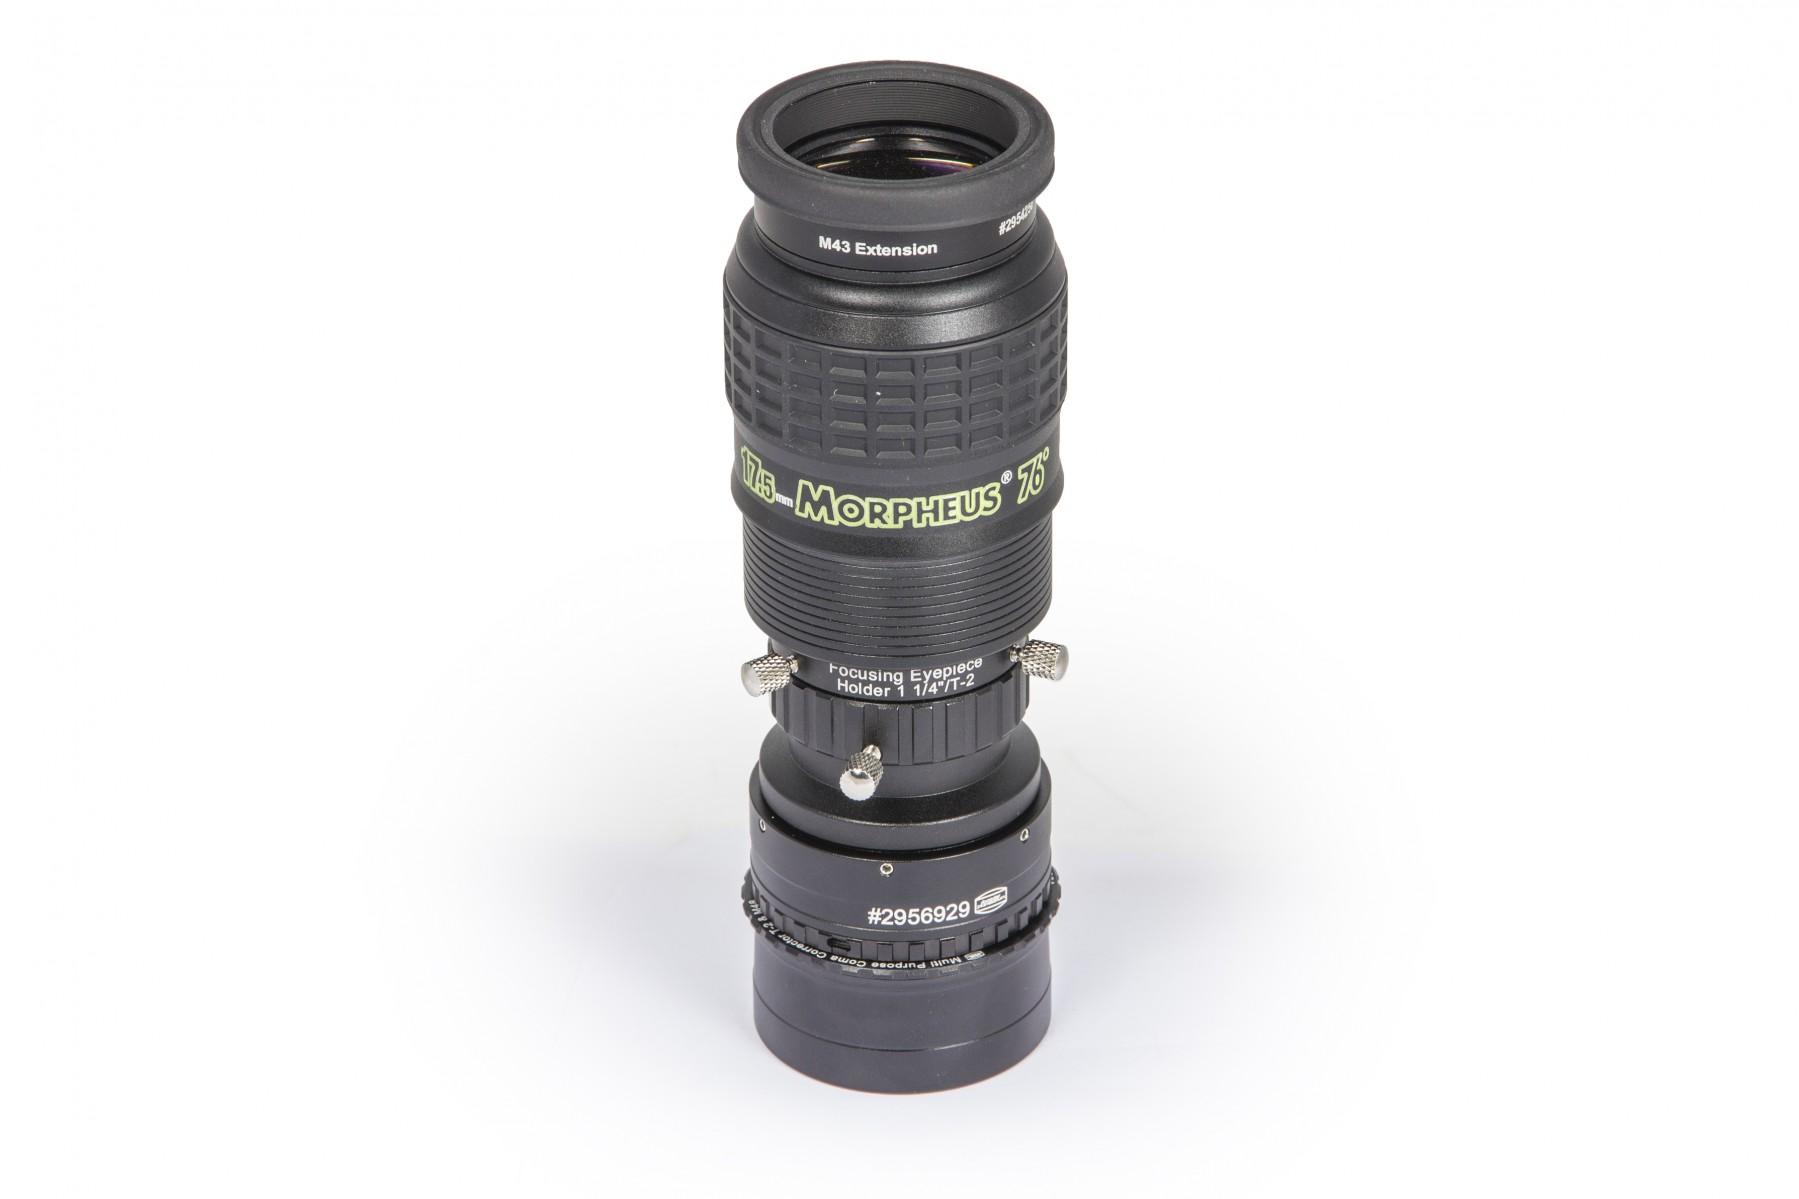 Anwendungsbild: MPCC V-1 Set  mit Morpheus Okular